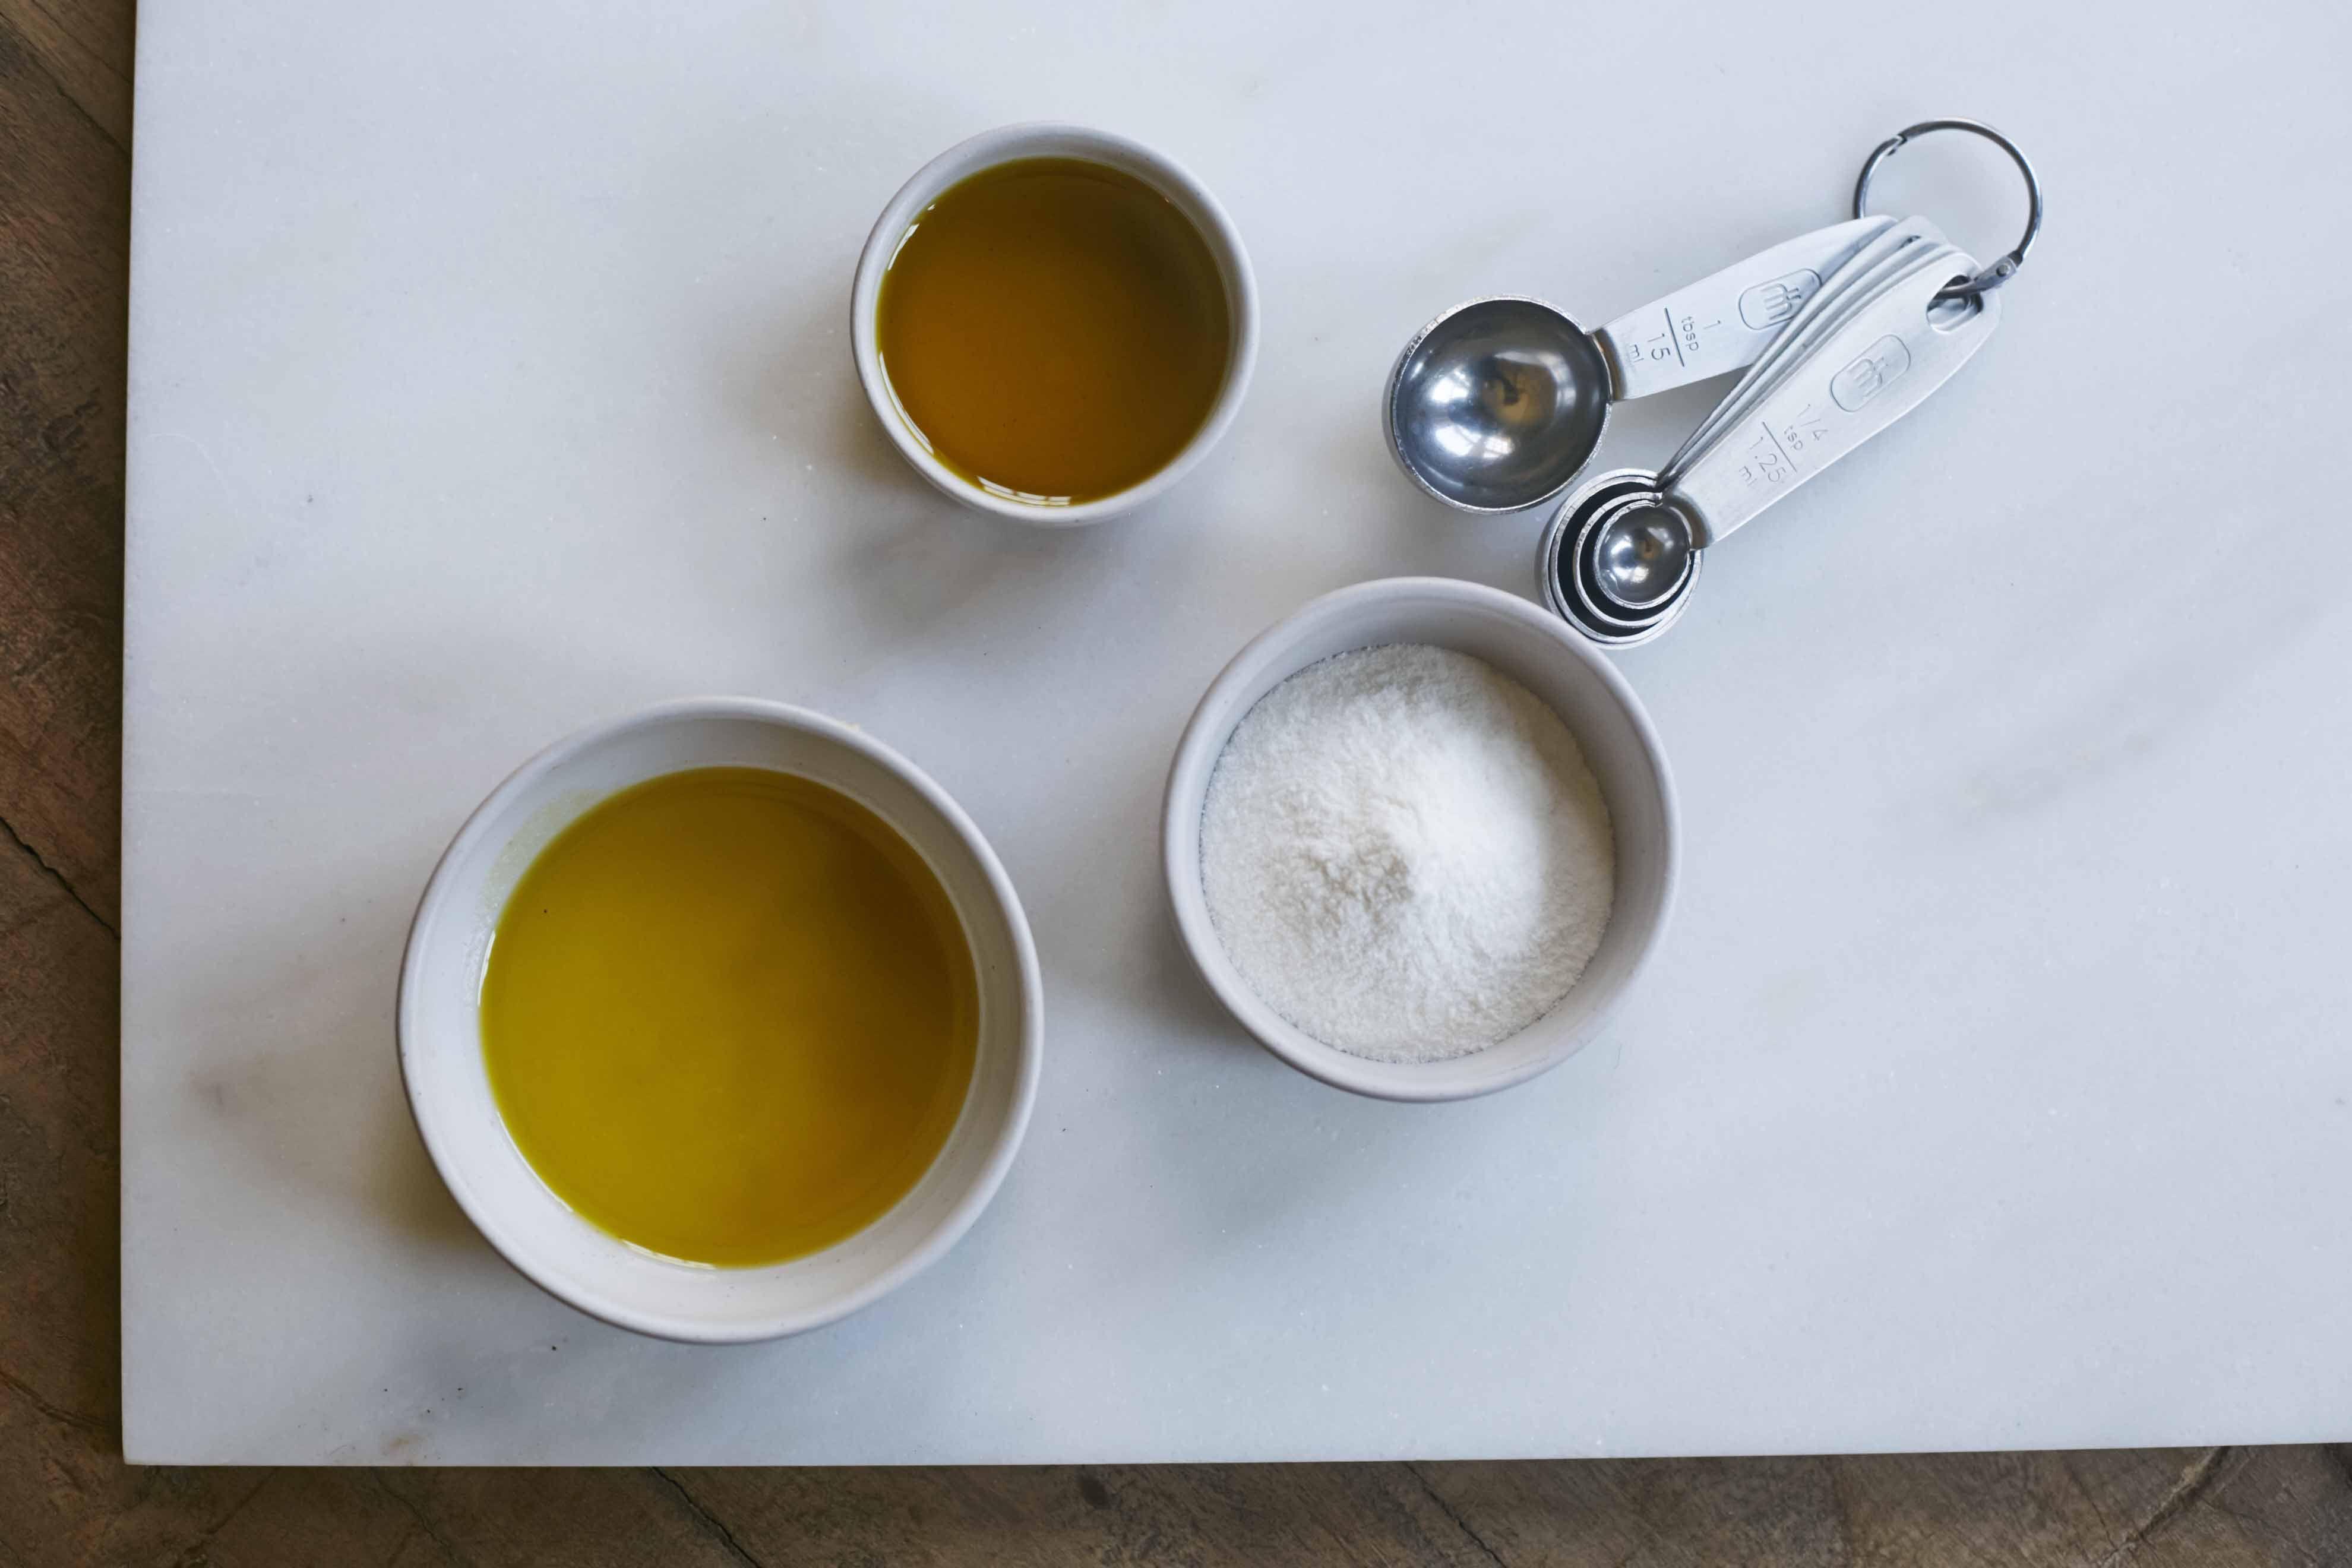 Giada de laurentiis beauty routine olive oil and rice